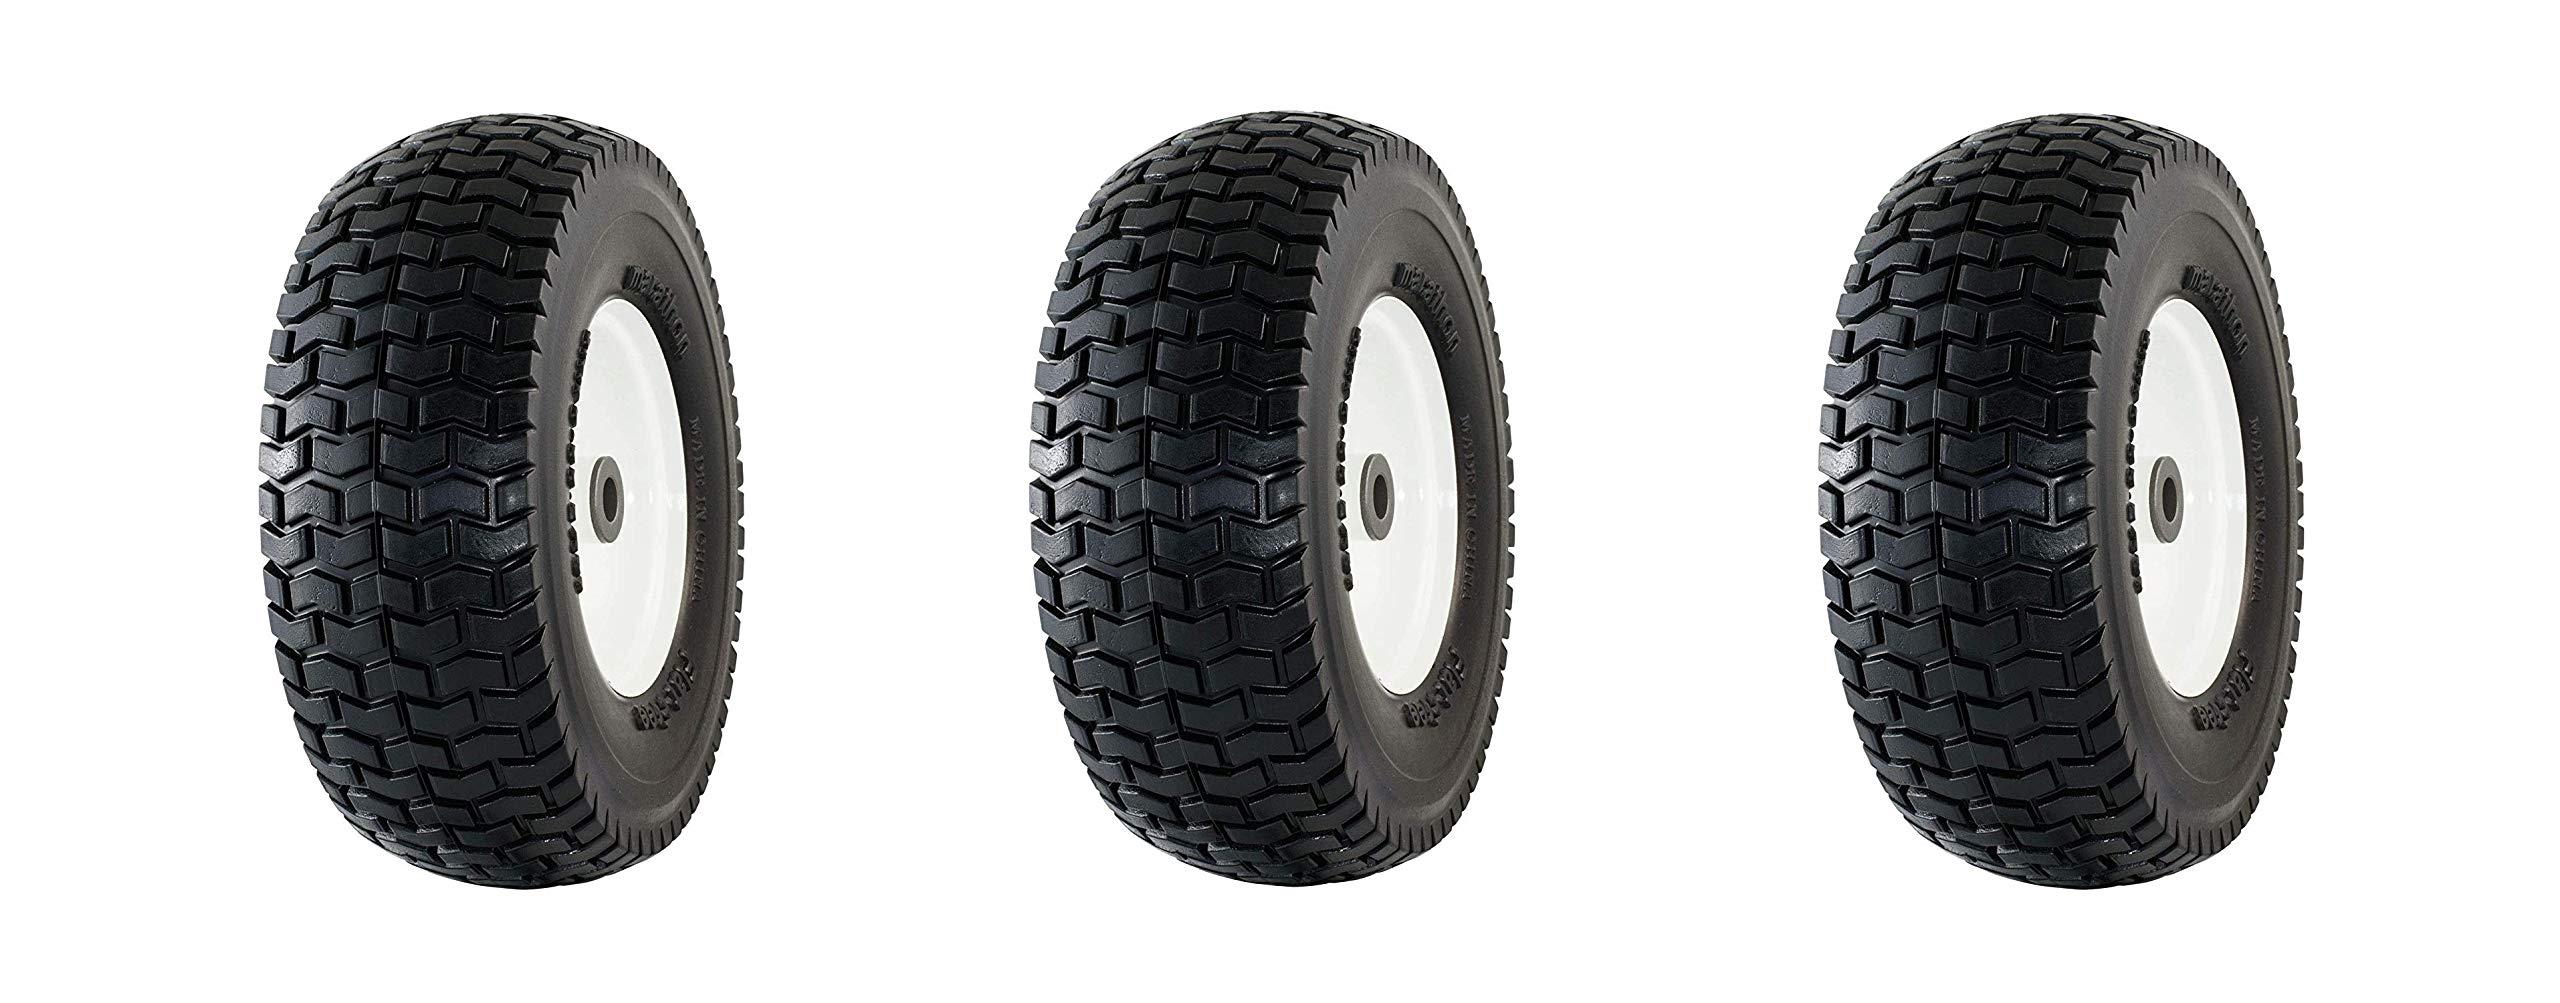 Marathon 13x5.00-6'' Flat Free Tire on Wheel, 3'' Hub, 3/4'' Bushings (Pack of 3) by Marathon Industries